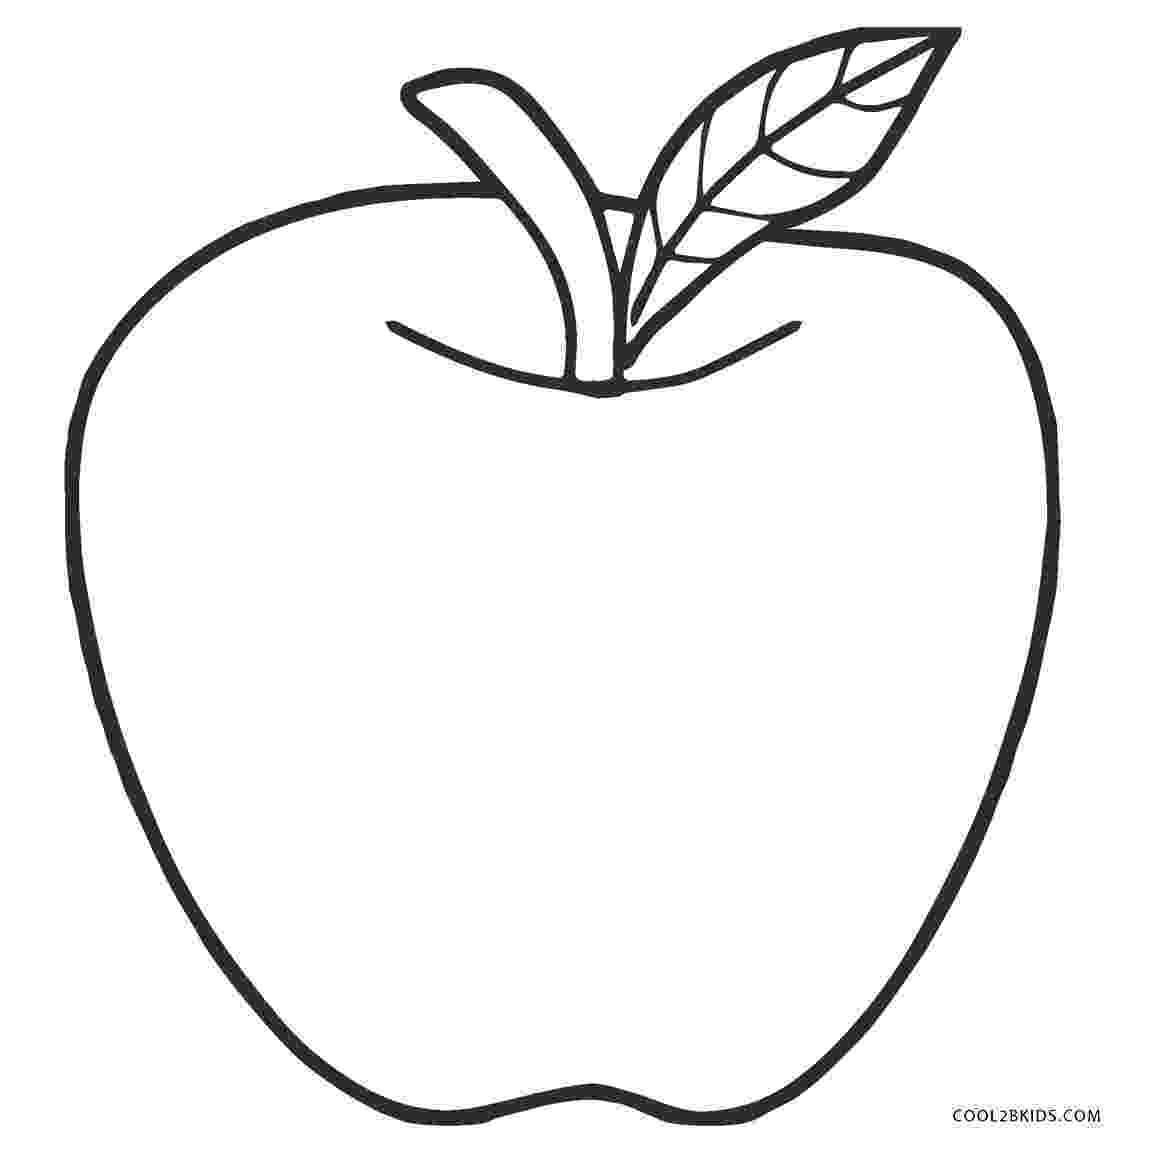 apple coloring sheet free printable apple coloring pages for kids cool2bkids apple coloring sheet